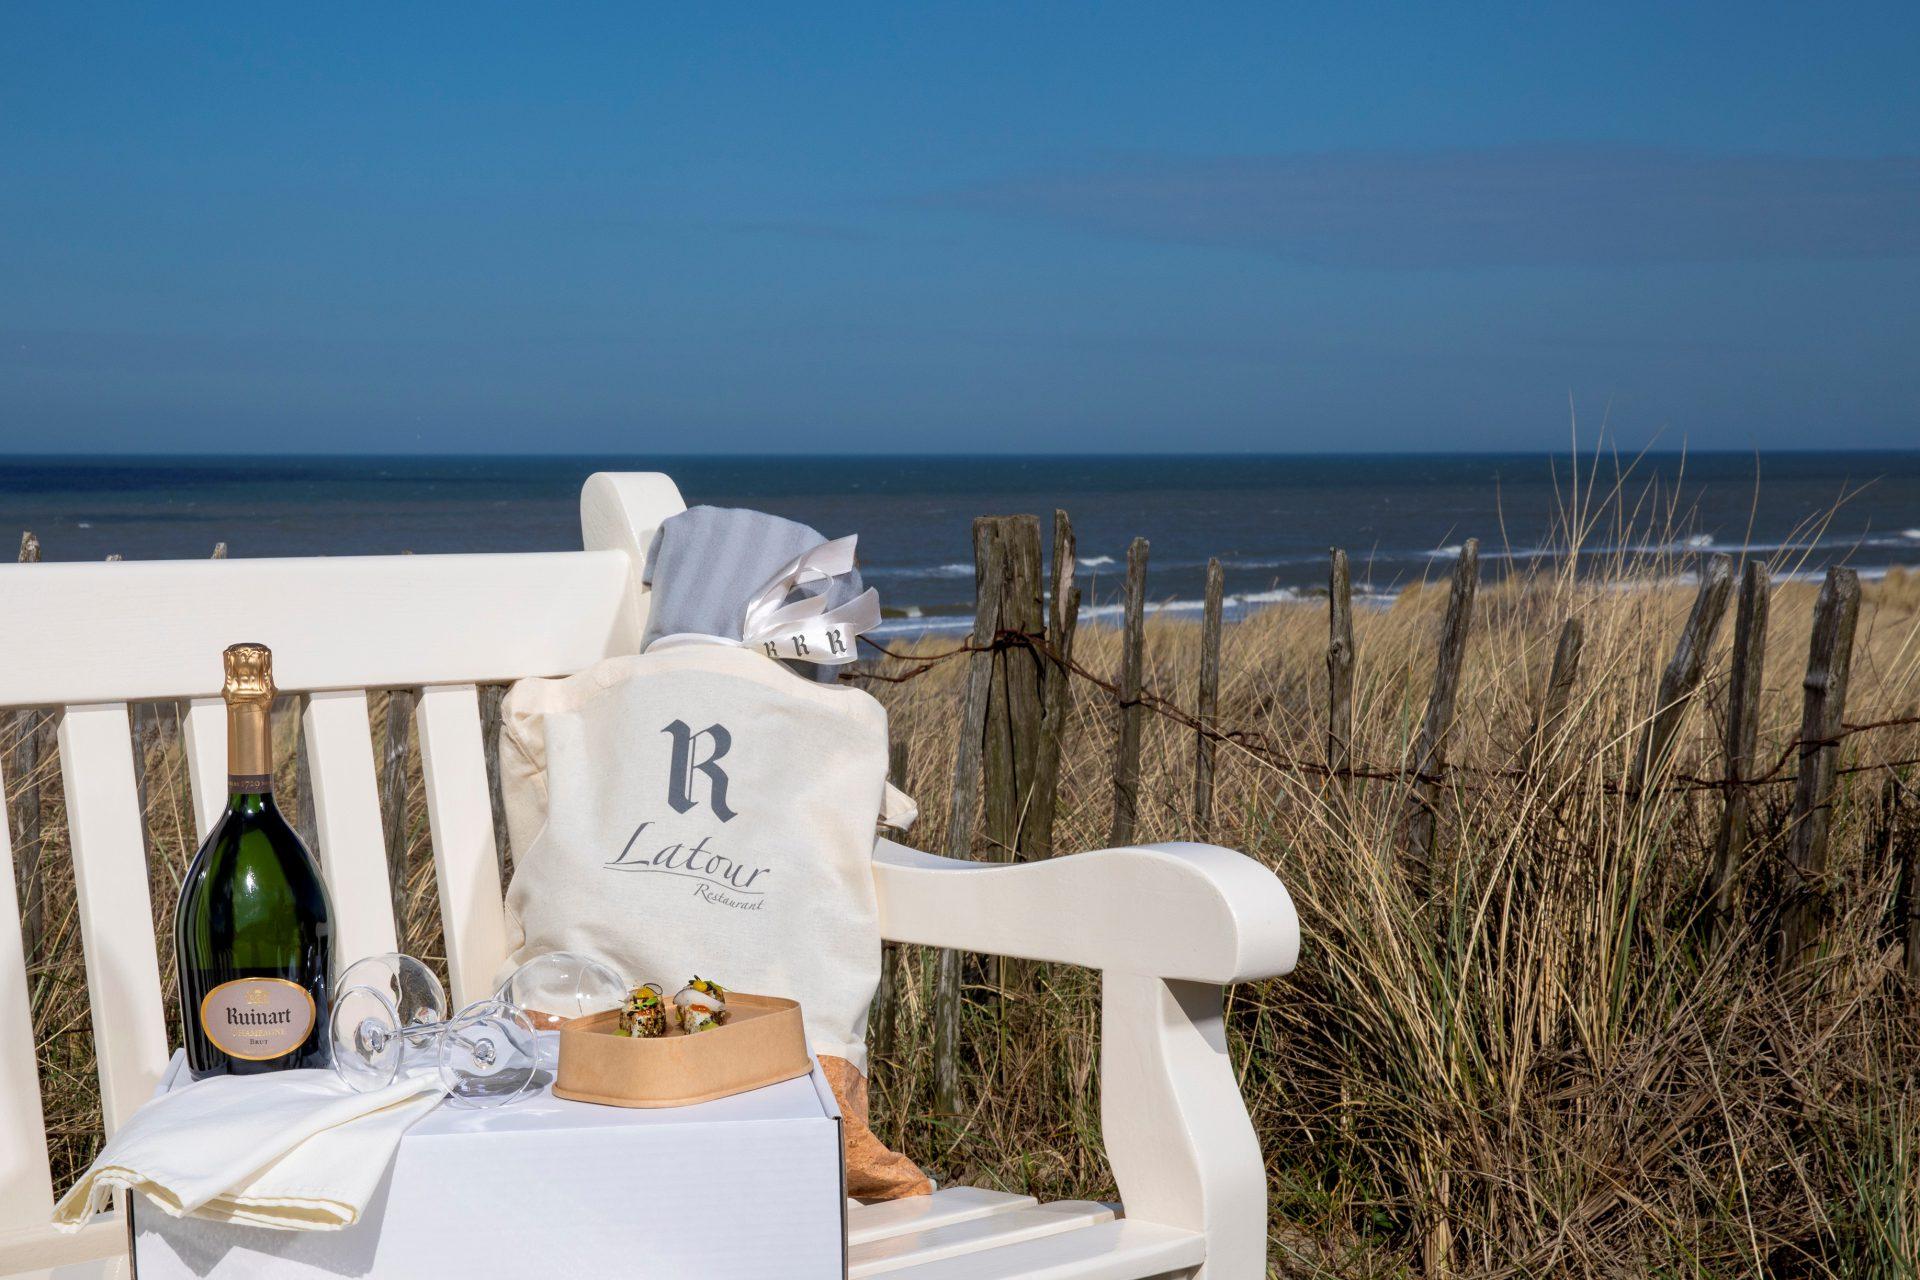 Restaurant-Latour-X-Ruinart-Picknick-Tasche